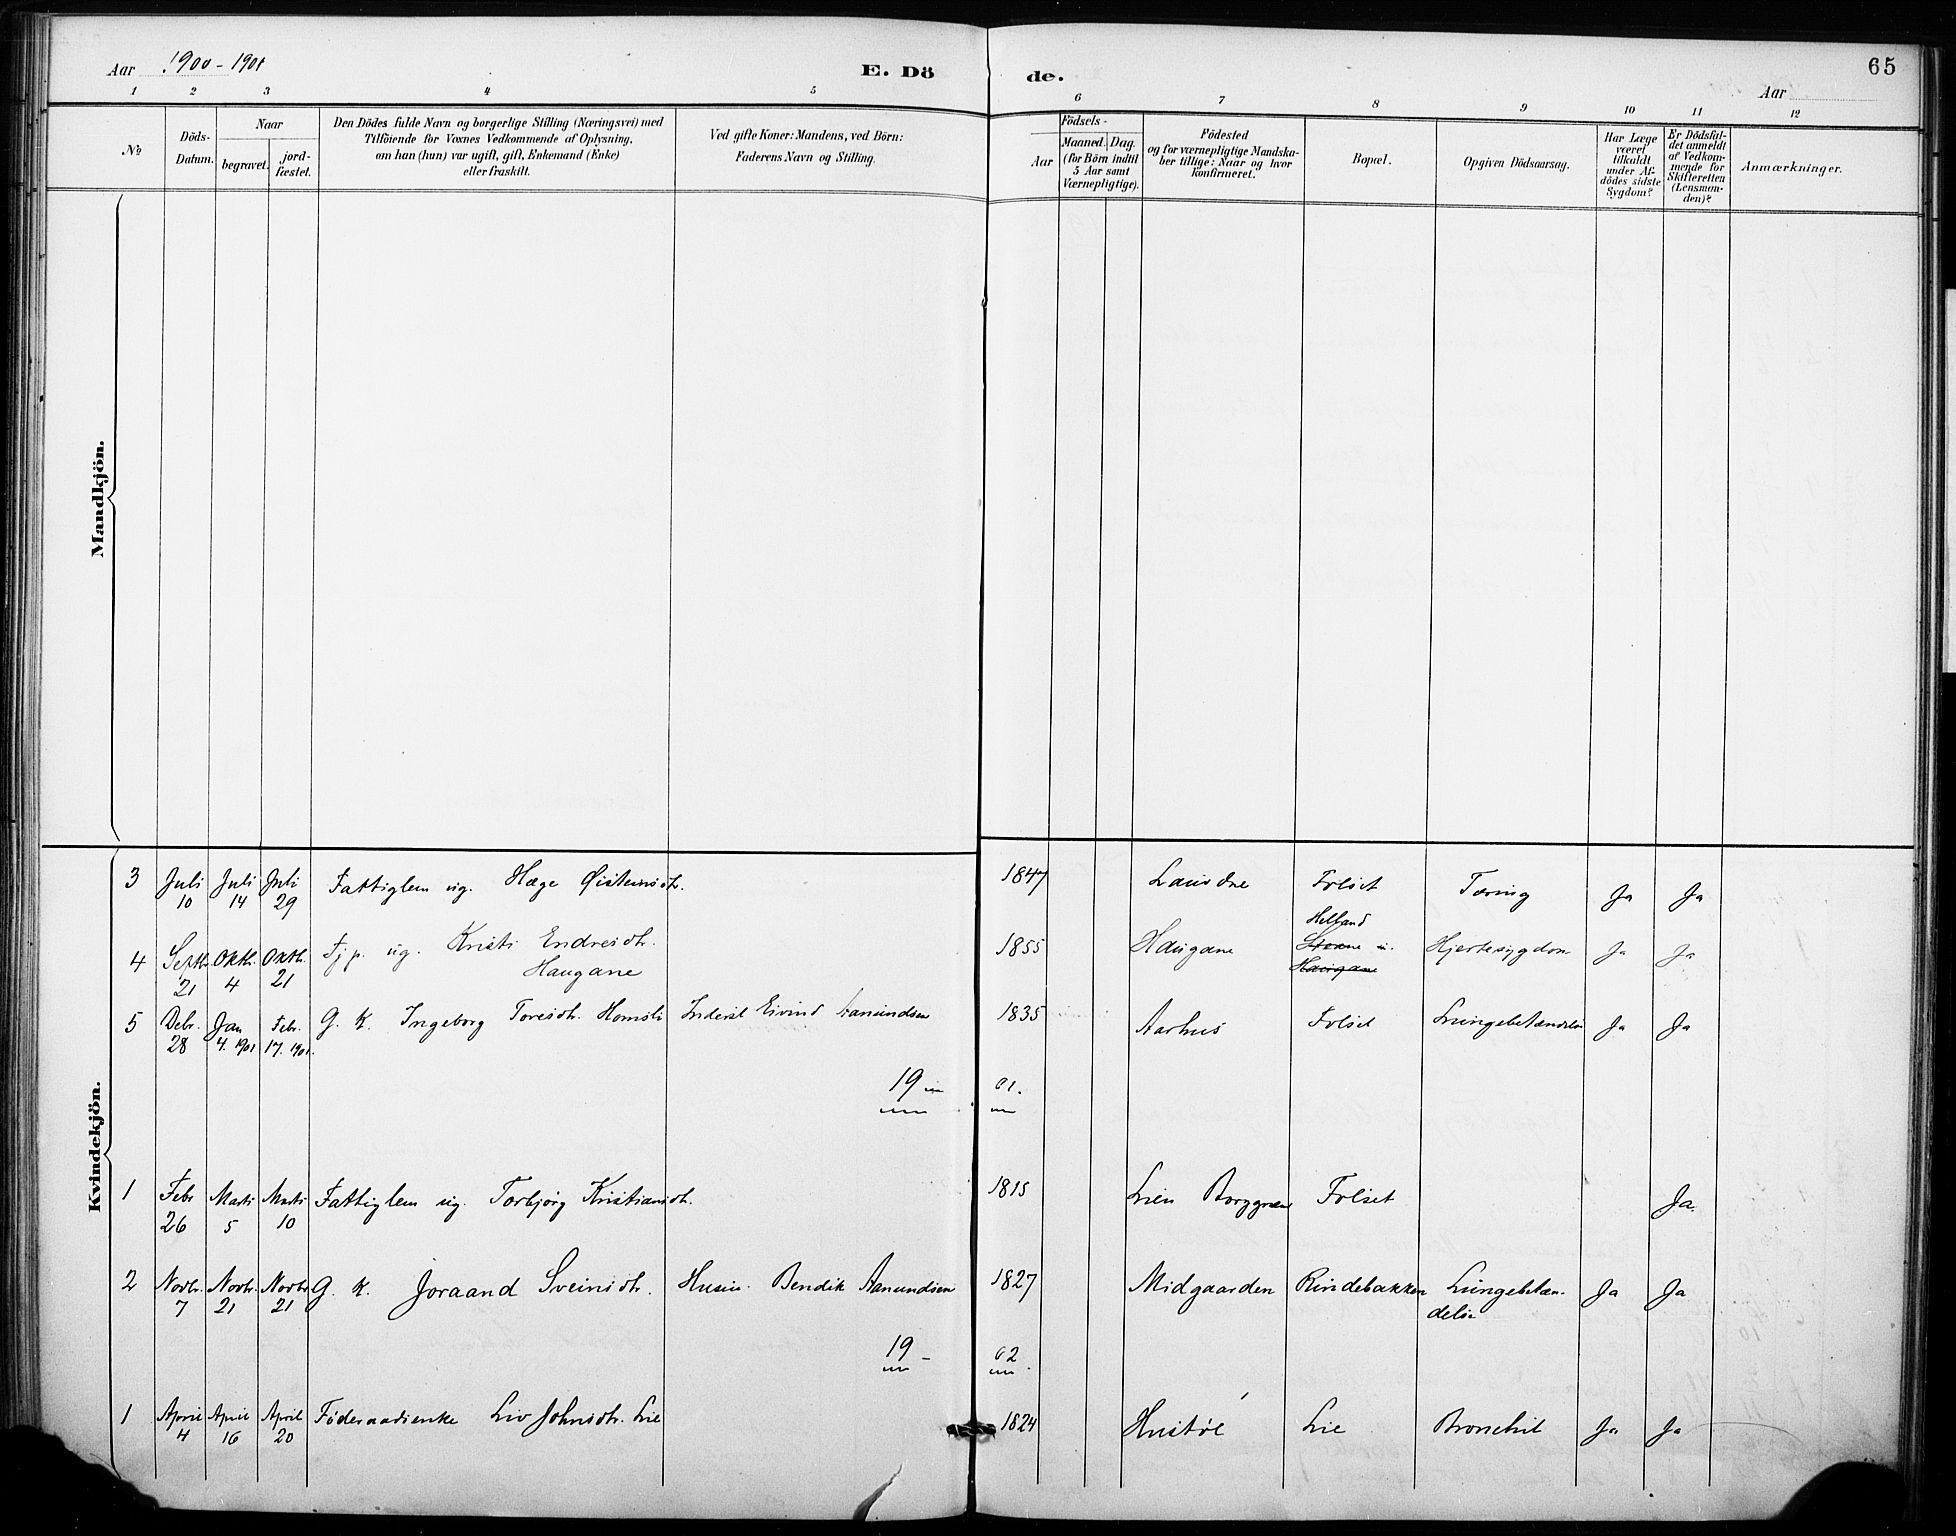 SAKO, Fyresdal kirkebøker, F/Fb/L0003: Ministerialbok nr. II 3, 1887-1903, s. 65